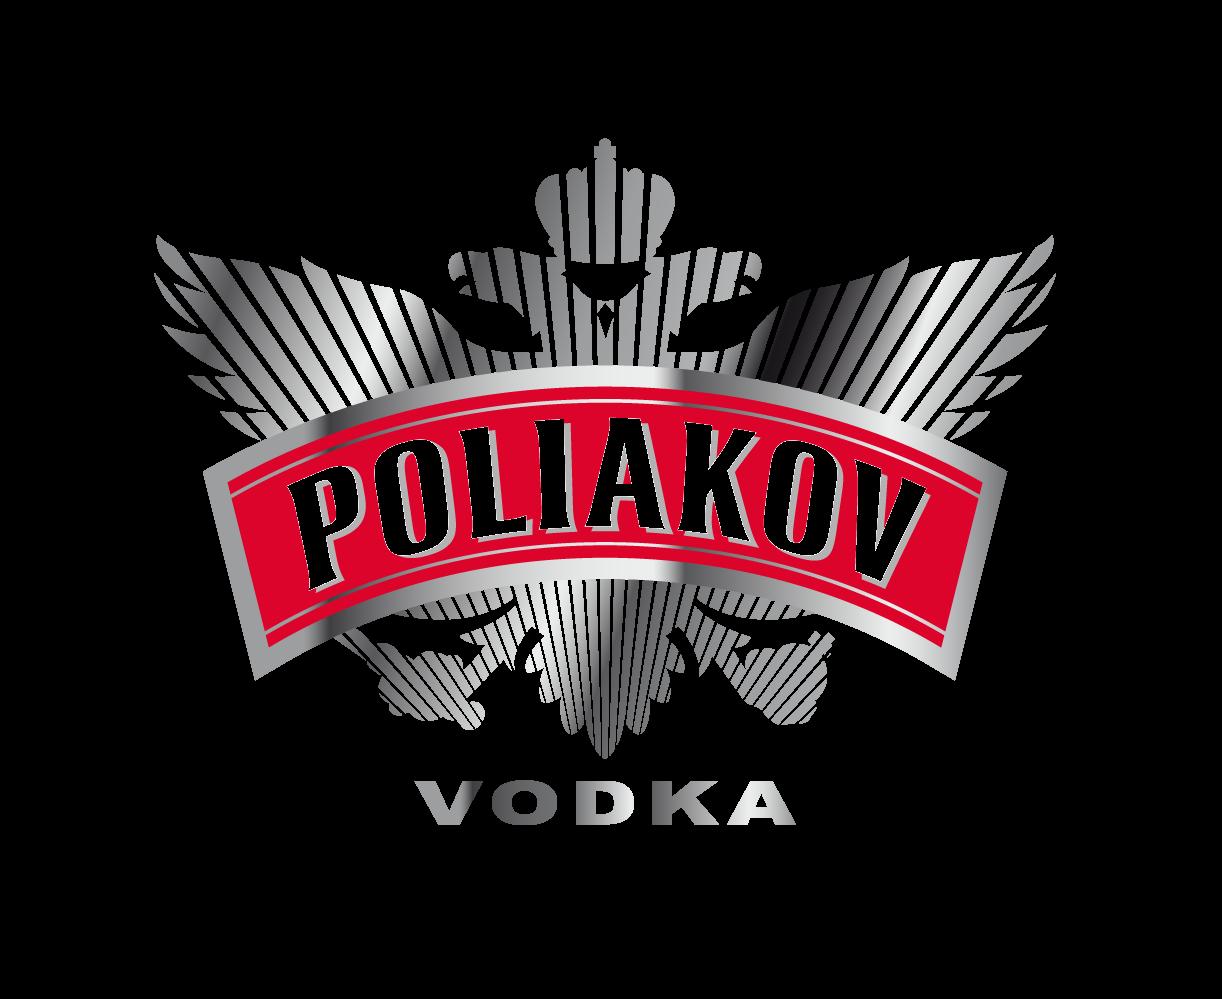 http://www.la-martiniquaise.com/brand/poliakov/